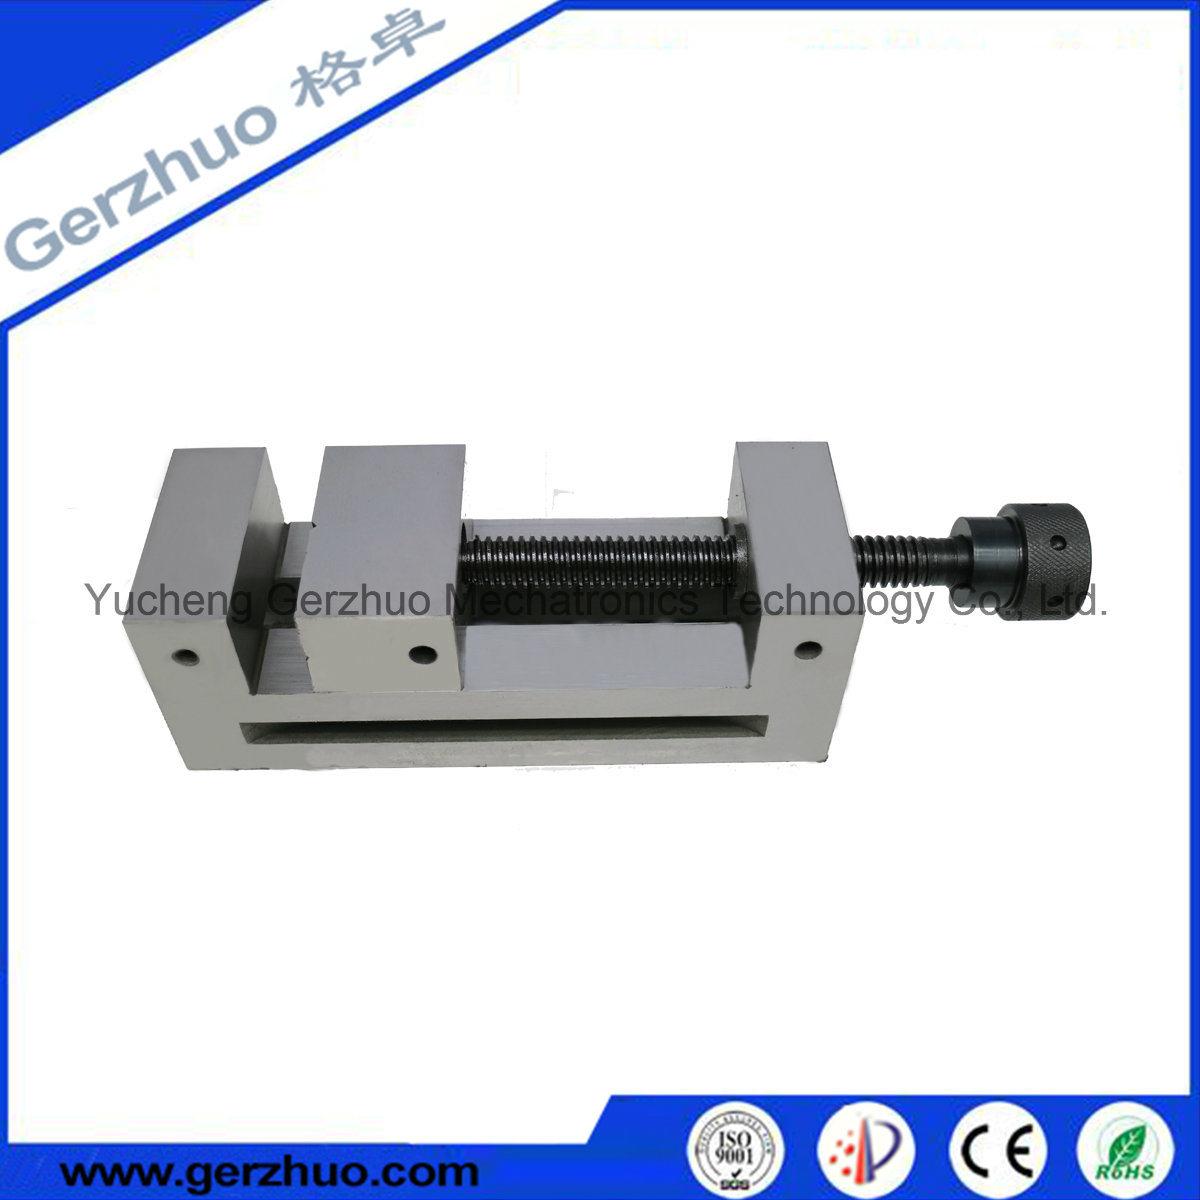 Precision Grinding Qgg Tool Vises for CNC Machine